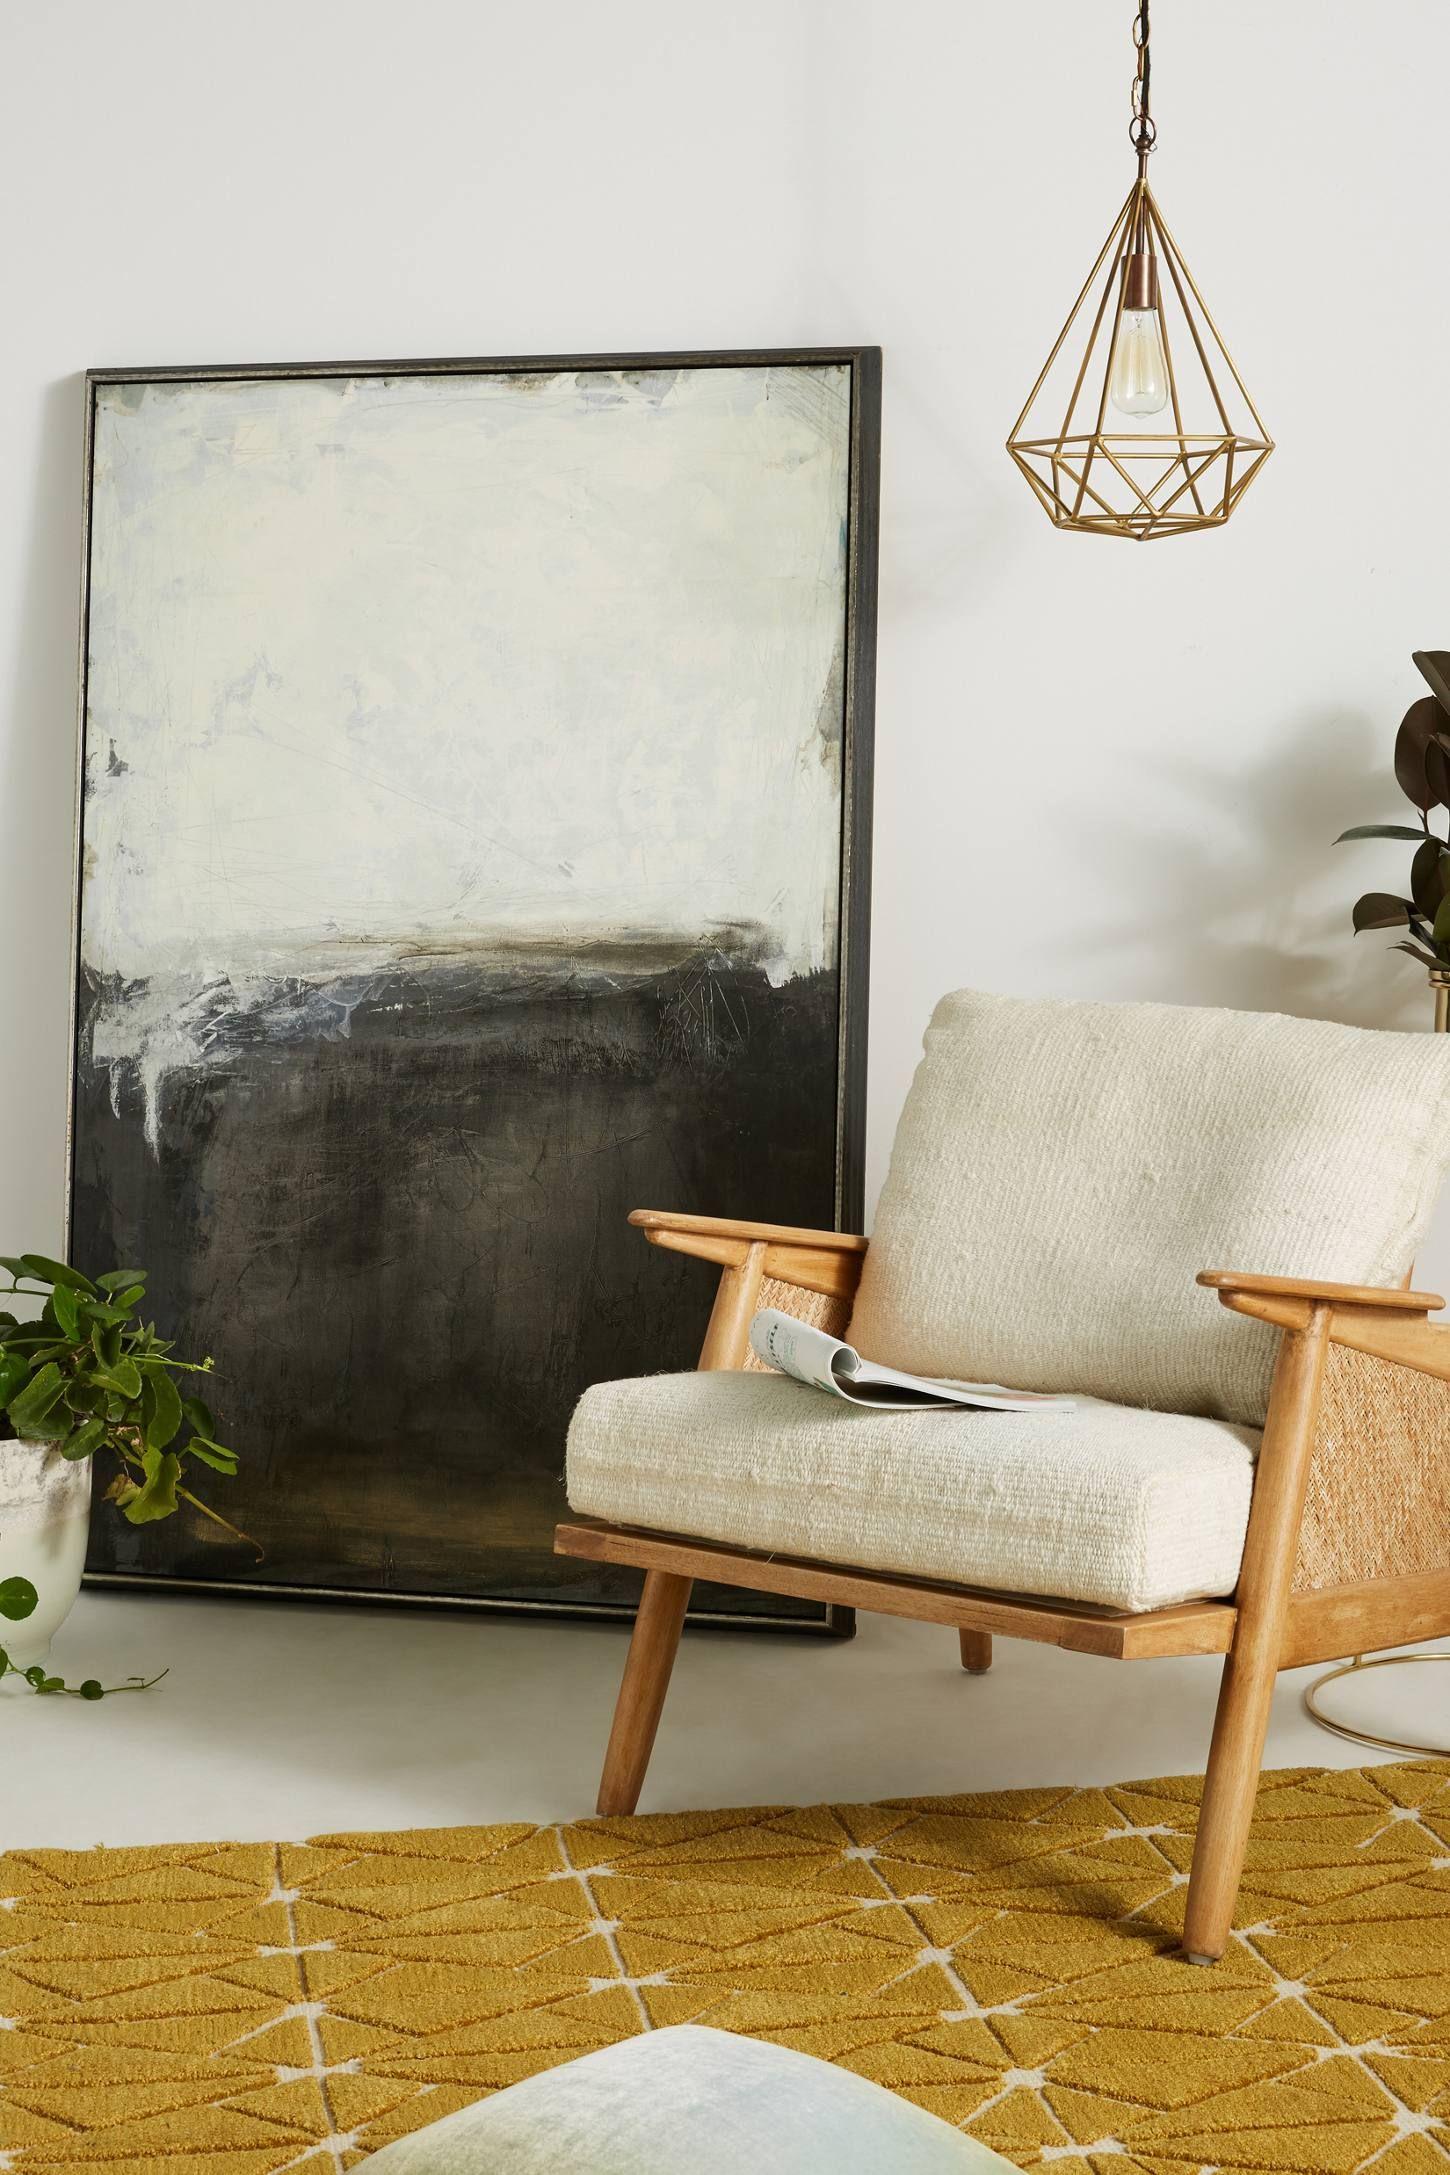 White Chocolate Mocha Wall Art | Pinterest | Walls, Apartment ...